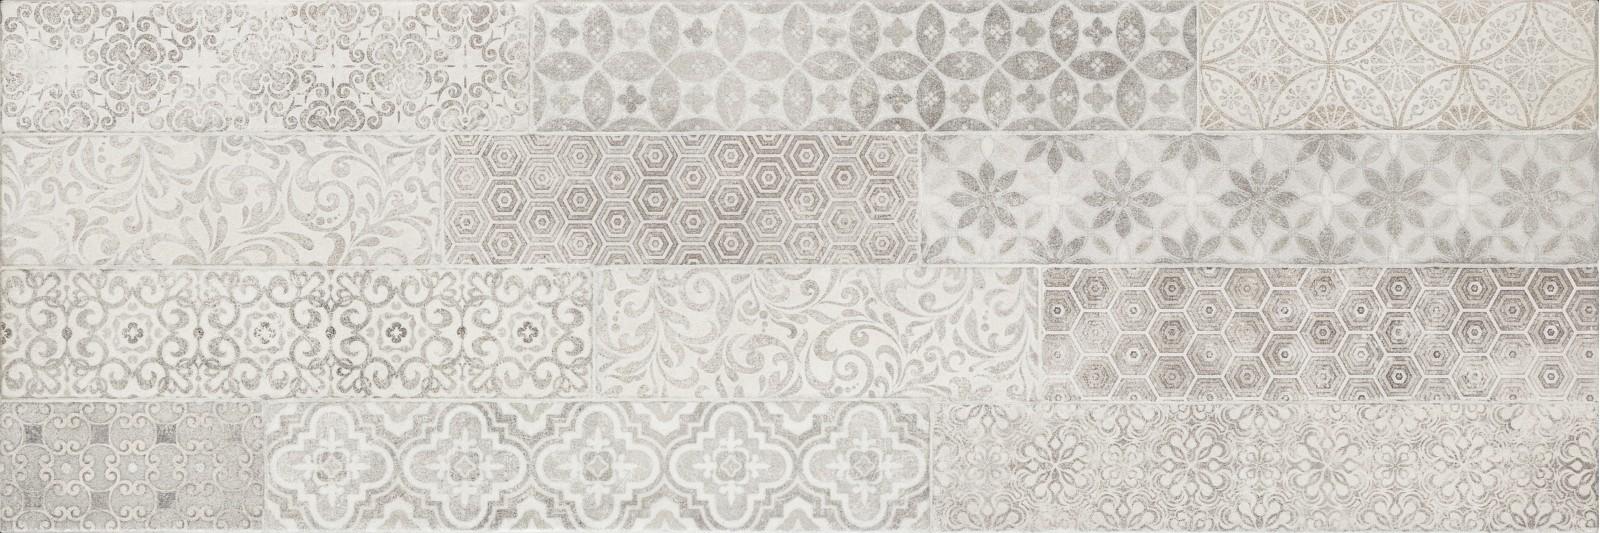 Декор Clayline Decoro Pattern Cotton 22x66.2